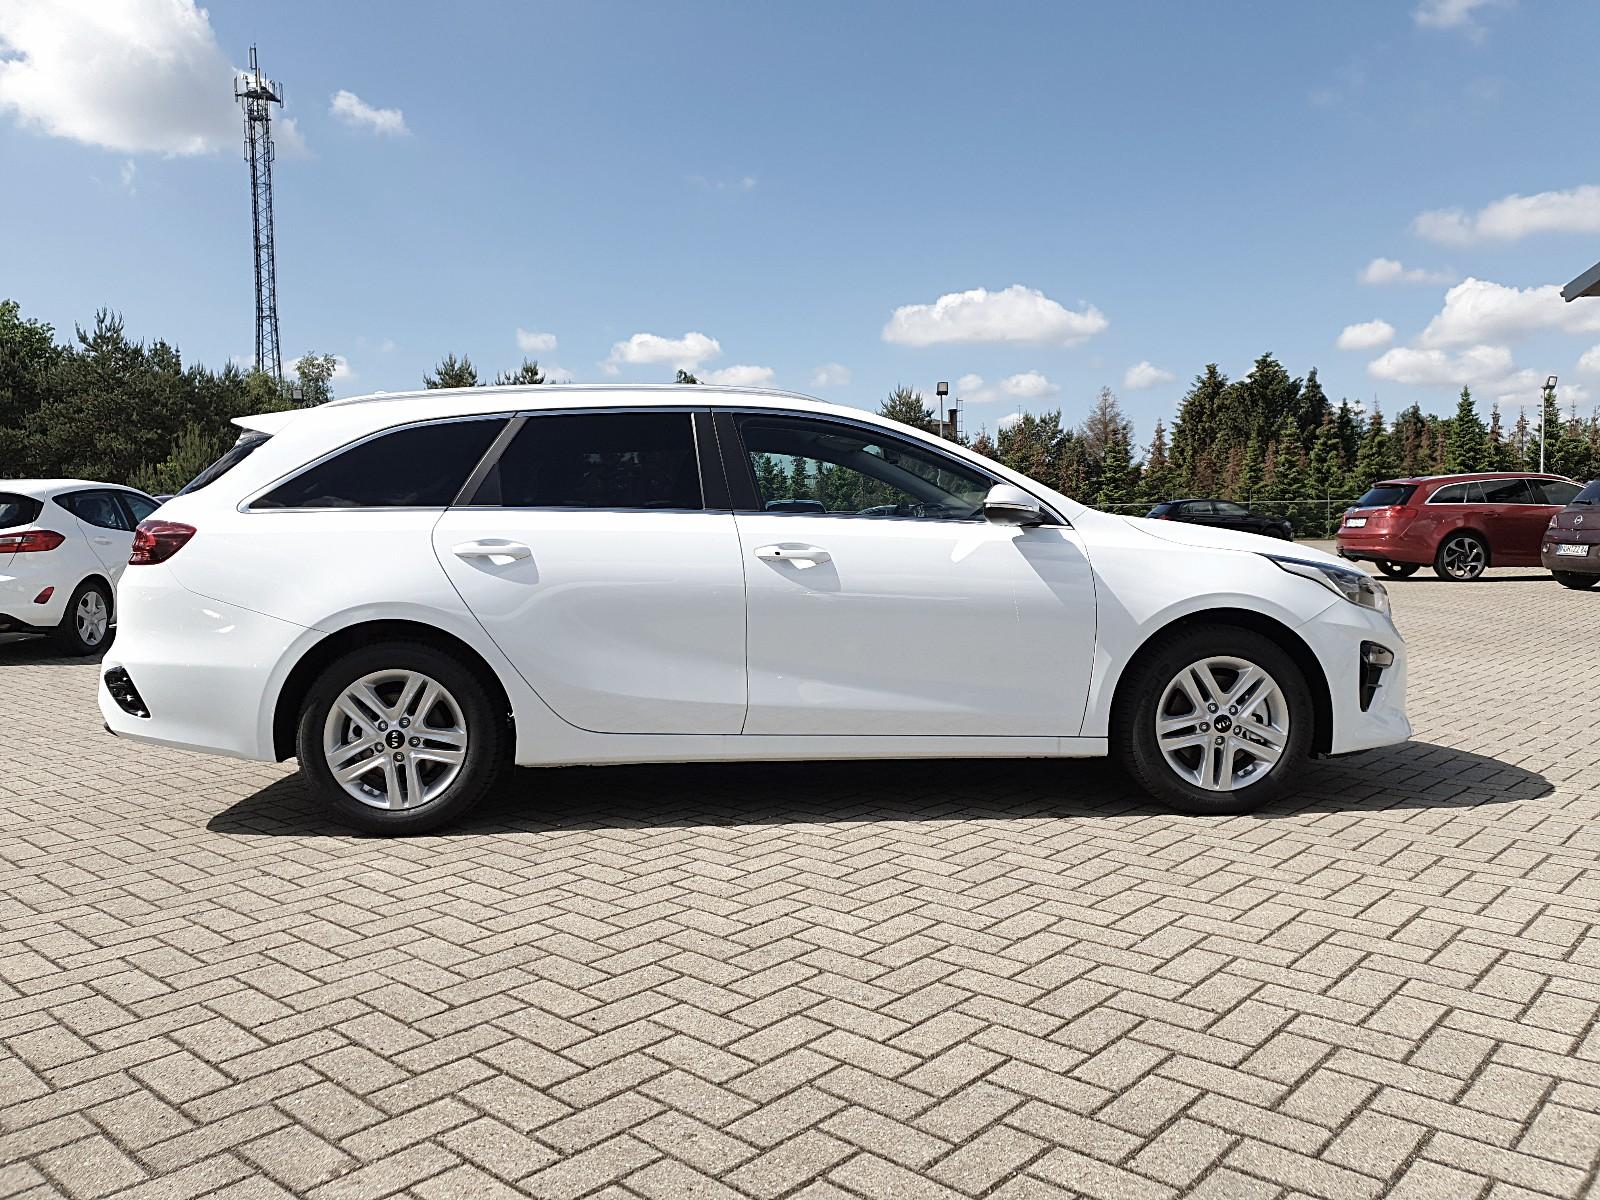 KIA CEED Cee'd Sportswagen 1.4 T-GDi  140PS Spirit Neues Modell Klimaauto Viscaal Fahrzeuggrosshandel GmbH, D-49847 Itterbeck